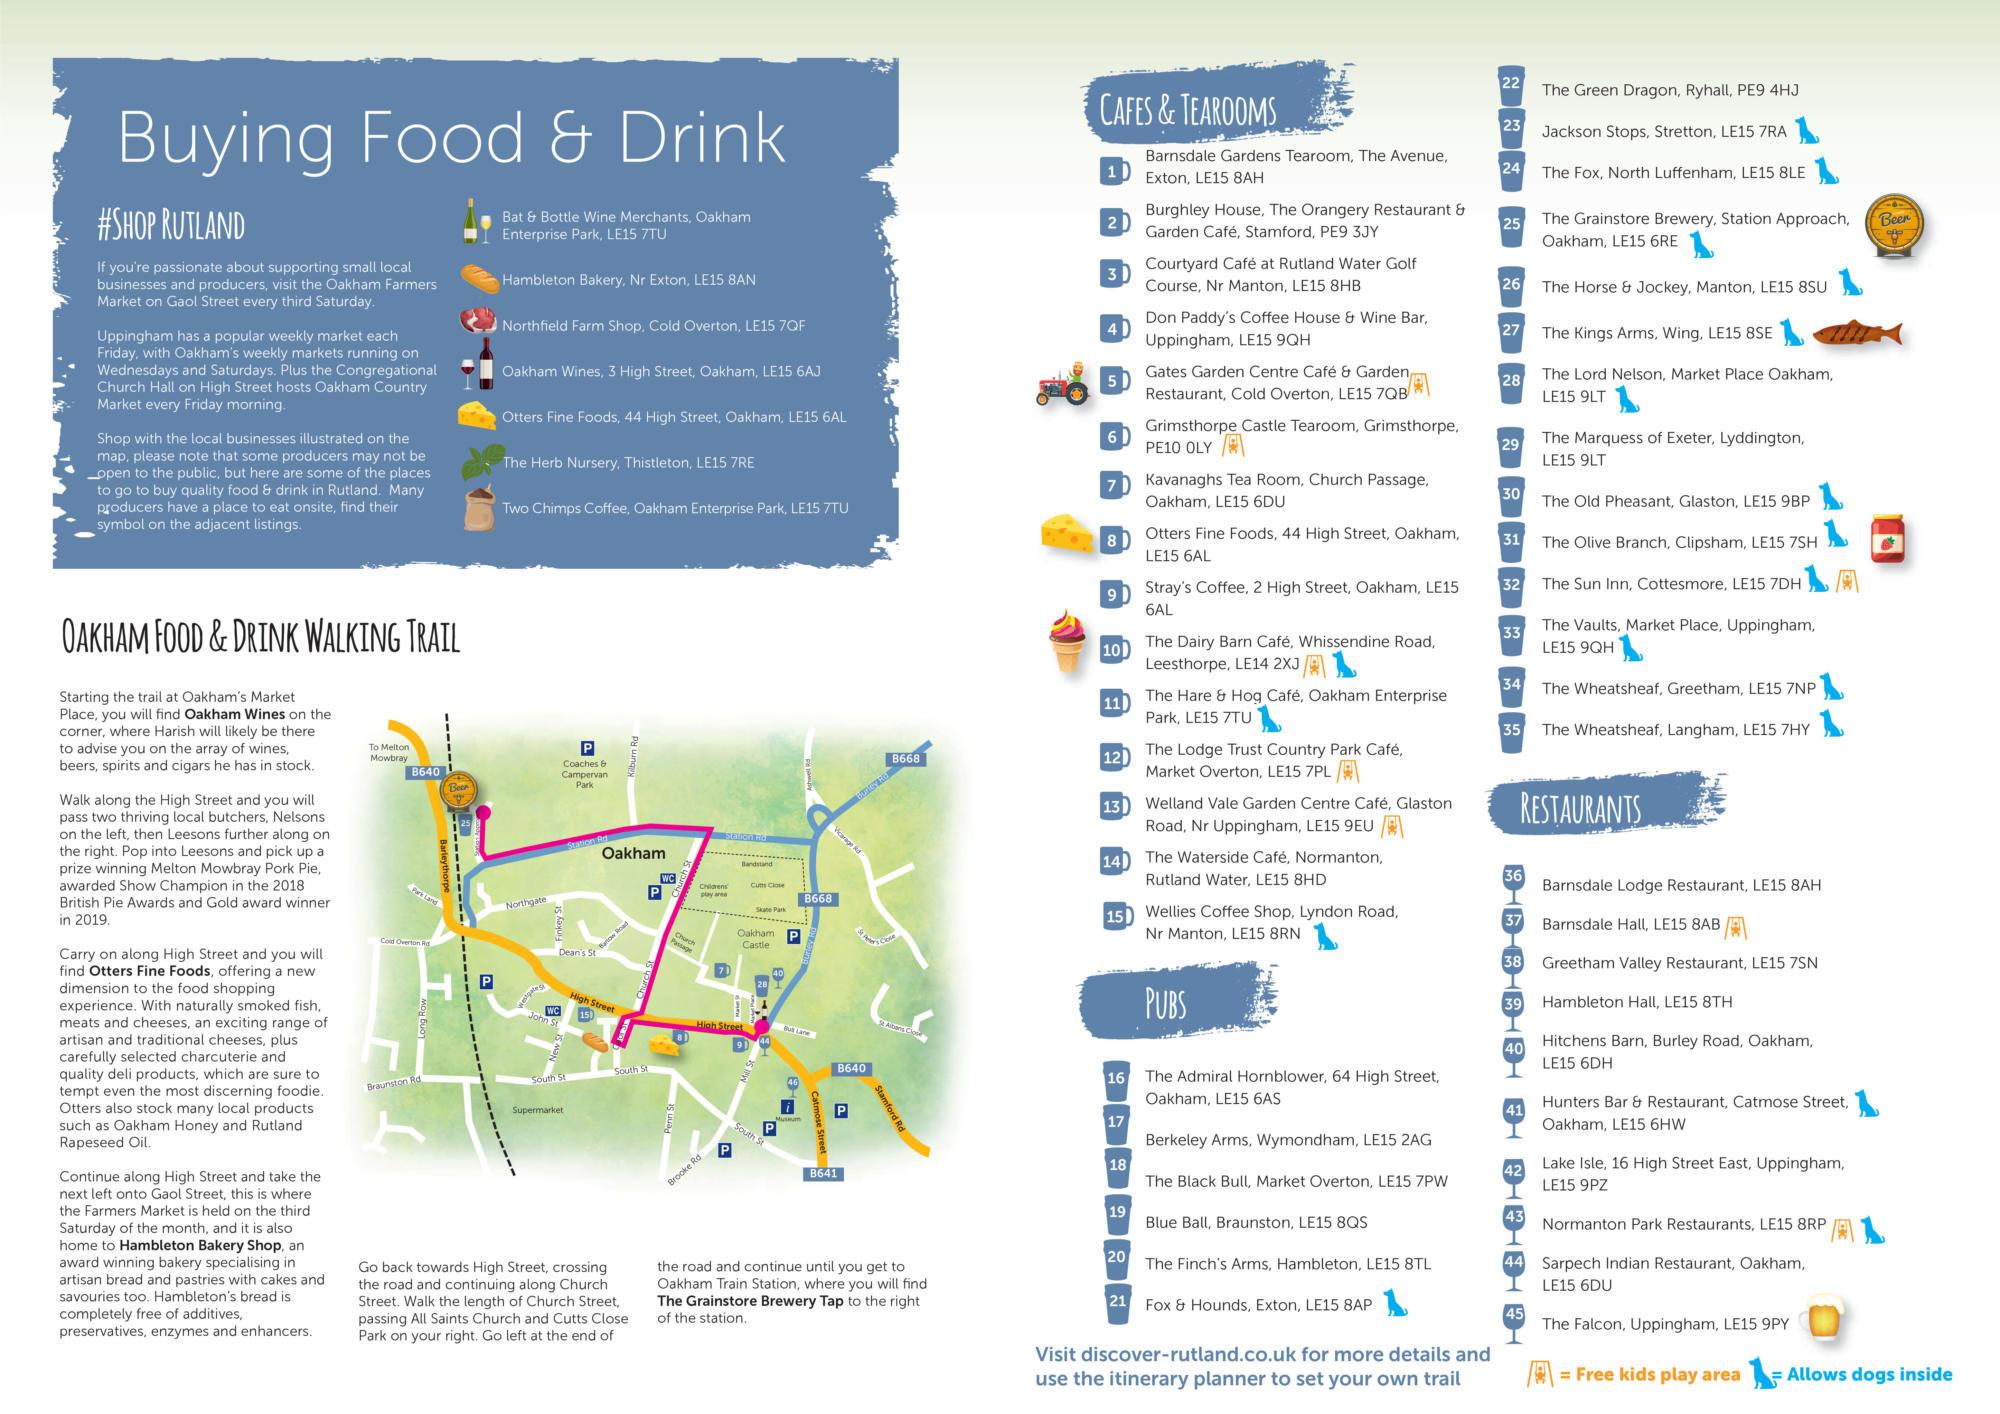 Rutland food and drink trail listing